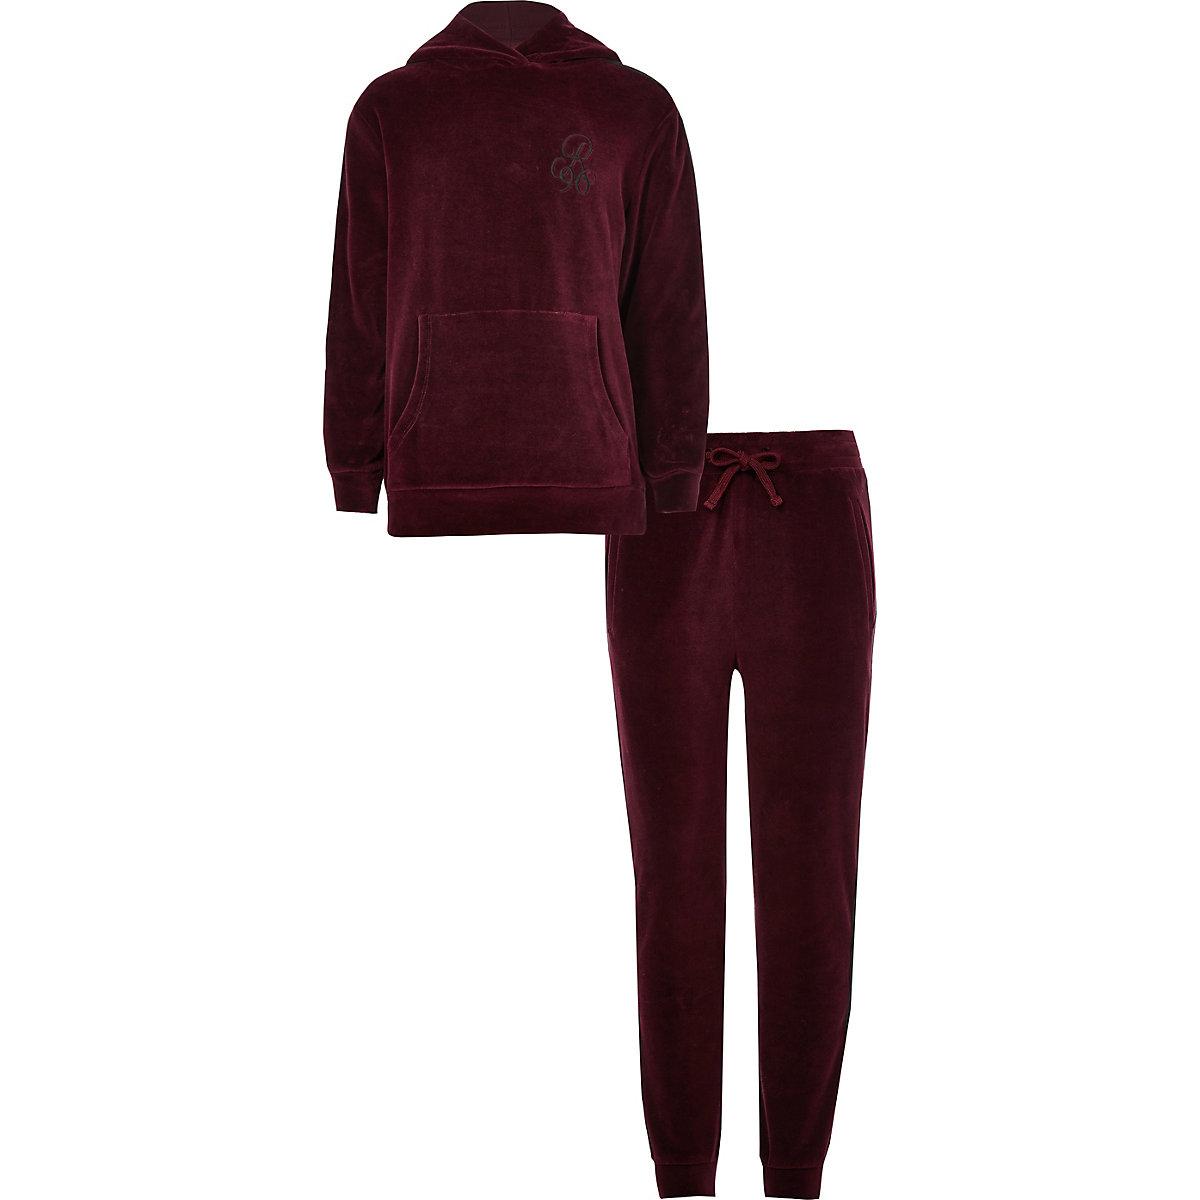 Boys burgundy 'R96' side stripe hoodie outfit